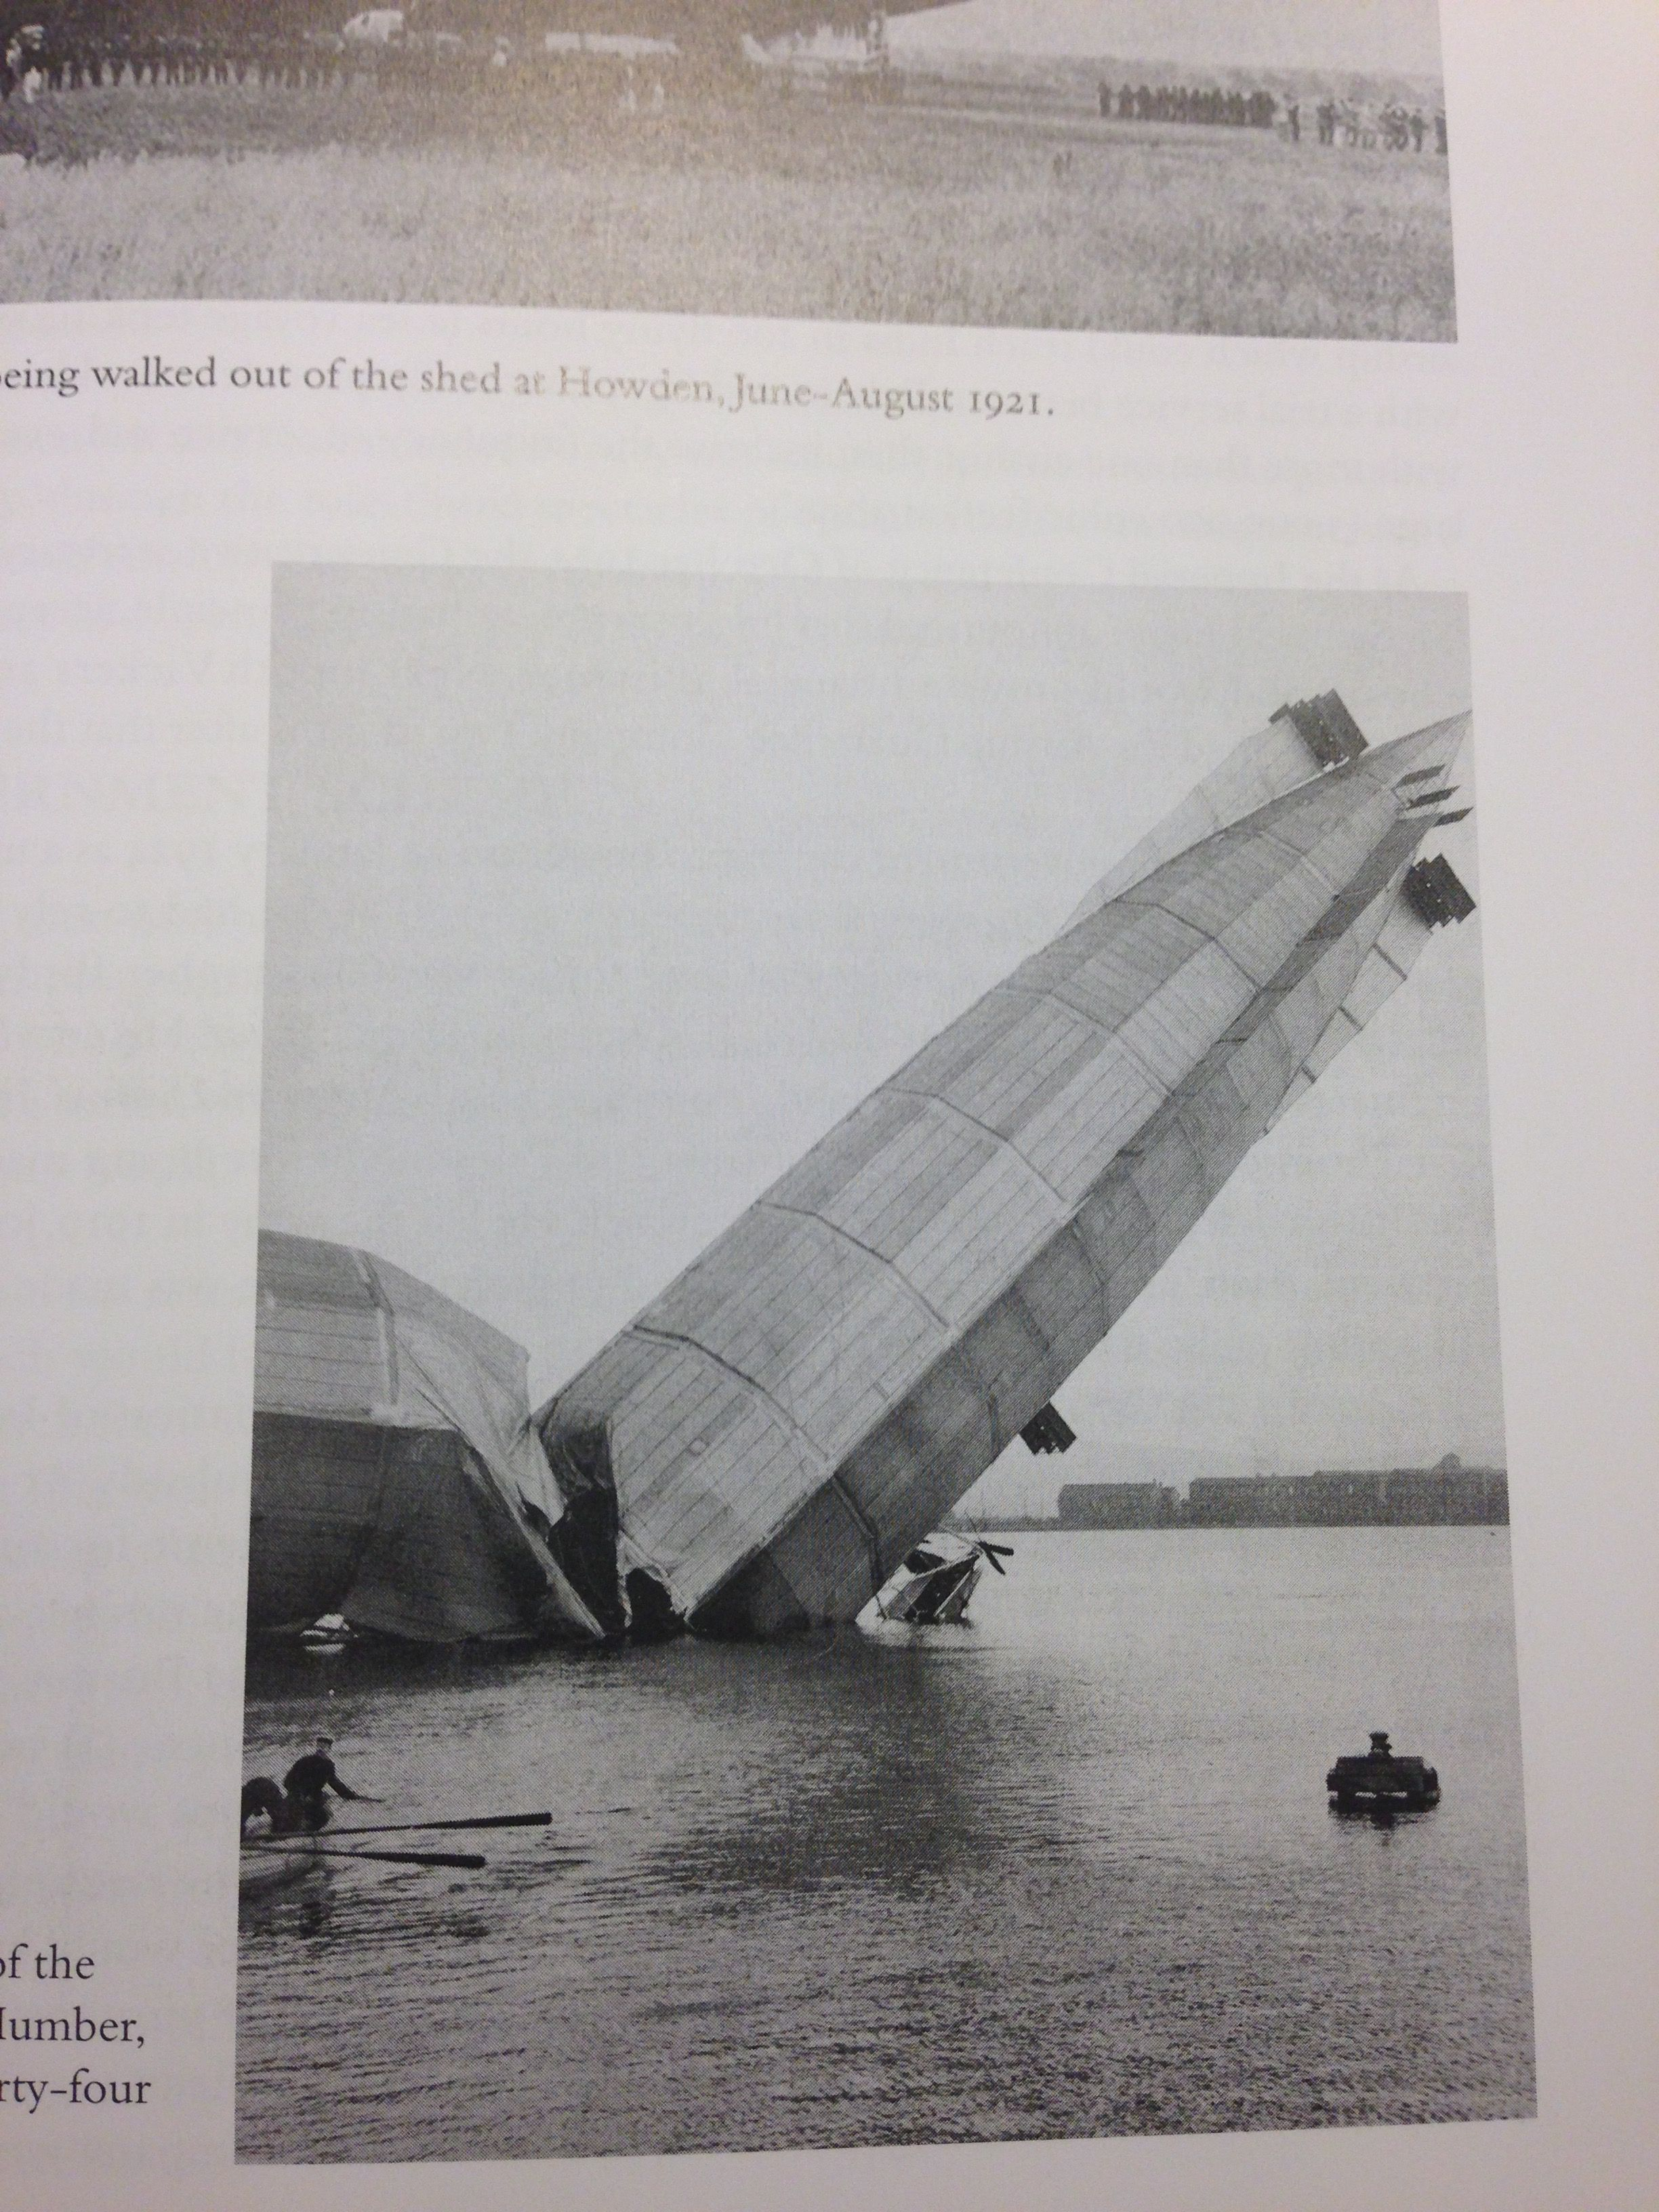 Crash on water! Zeppelin airship, Airship balloon, Zeppelin